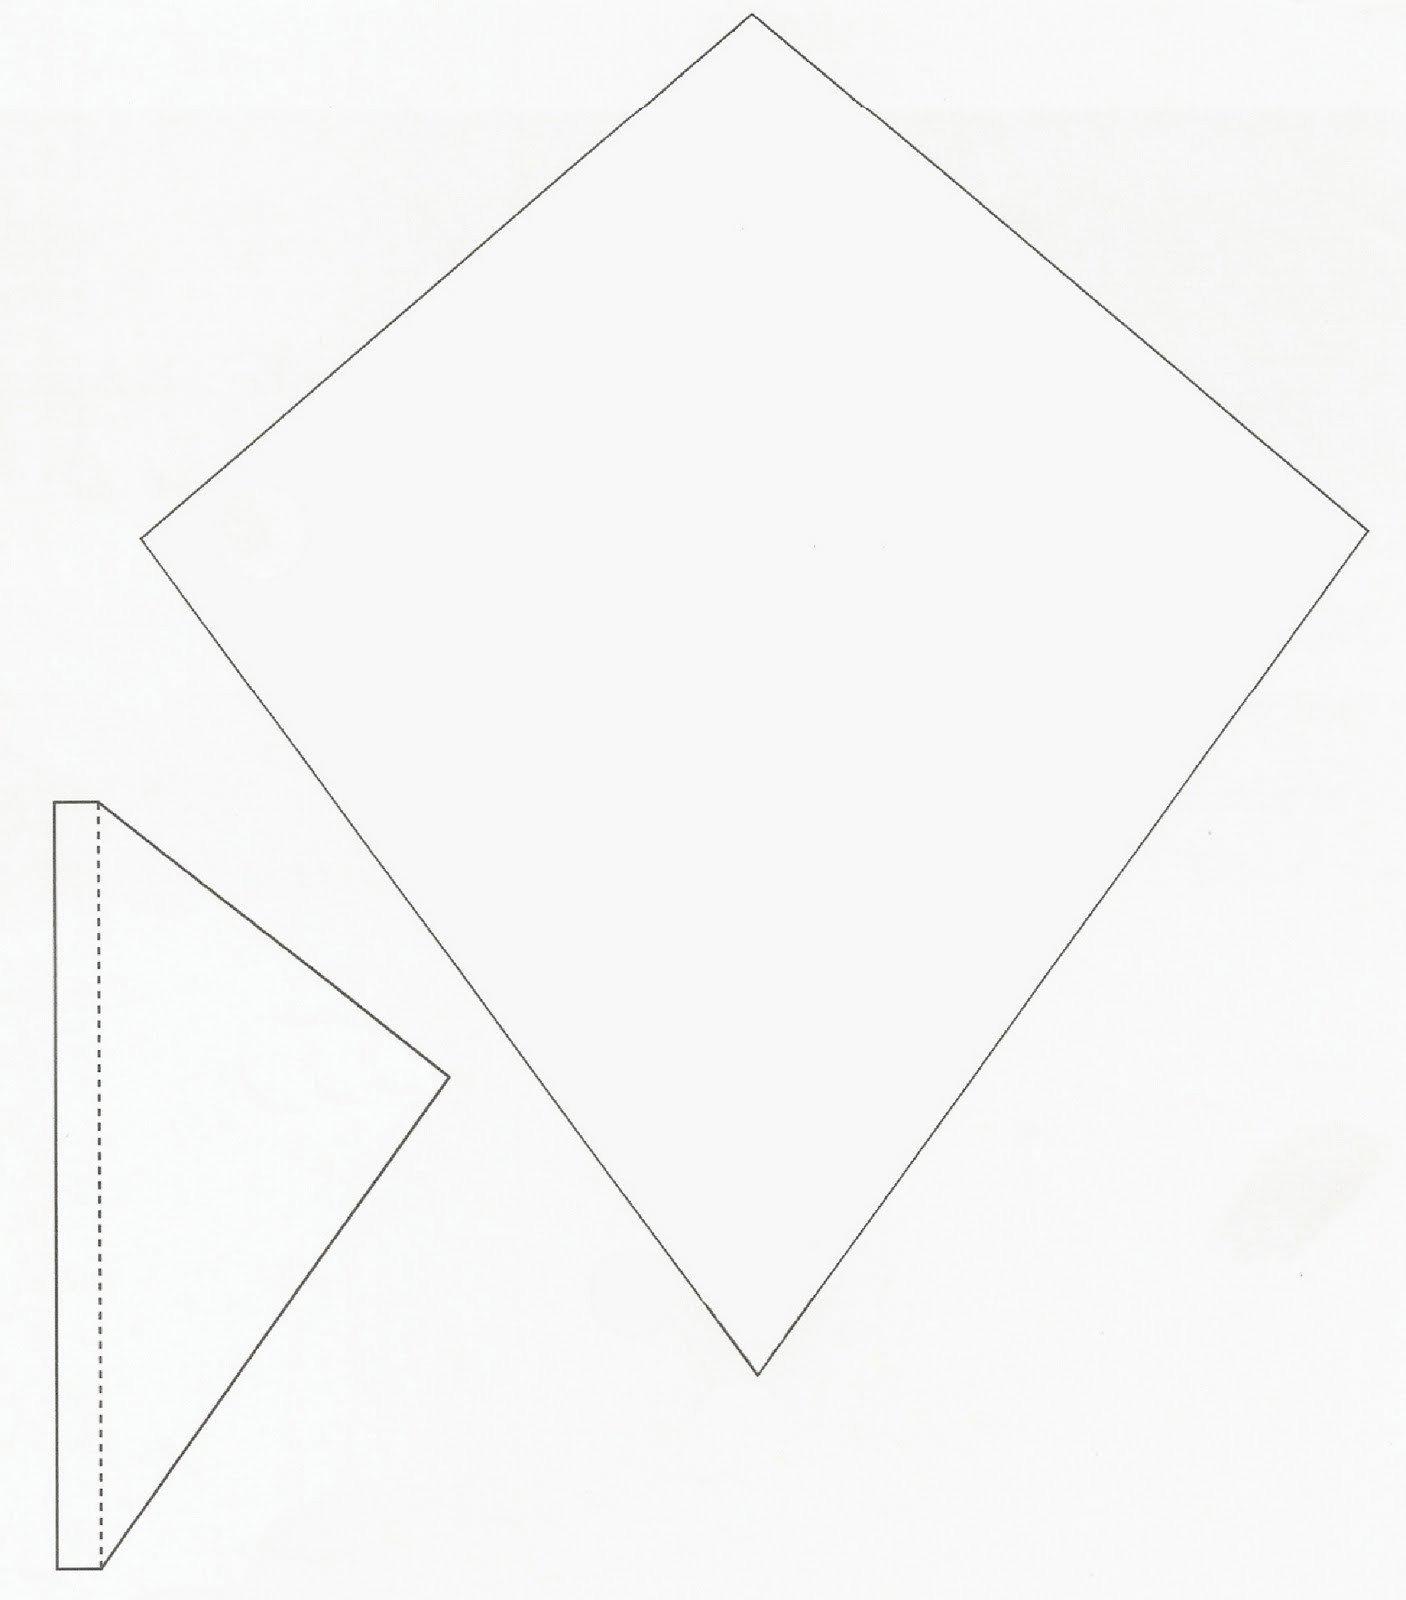 Small Kite Template Express Your Creativity Tar Bag Kites